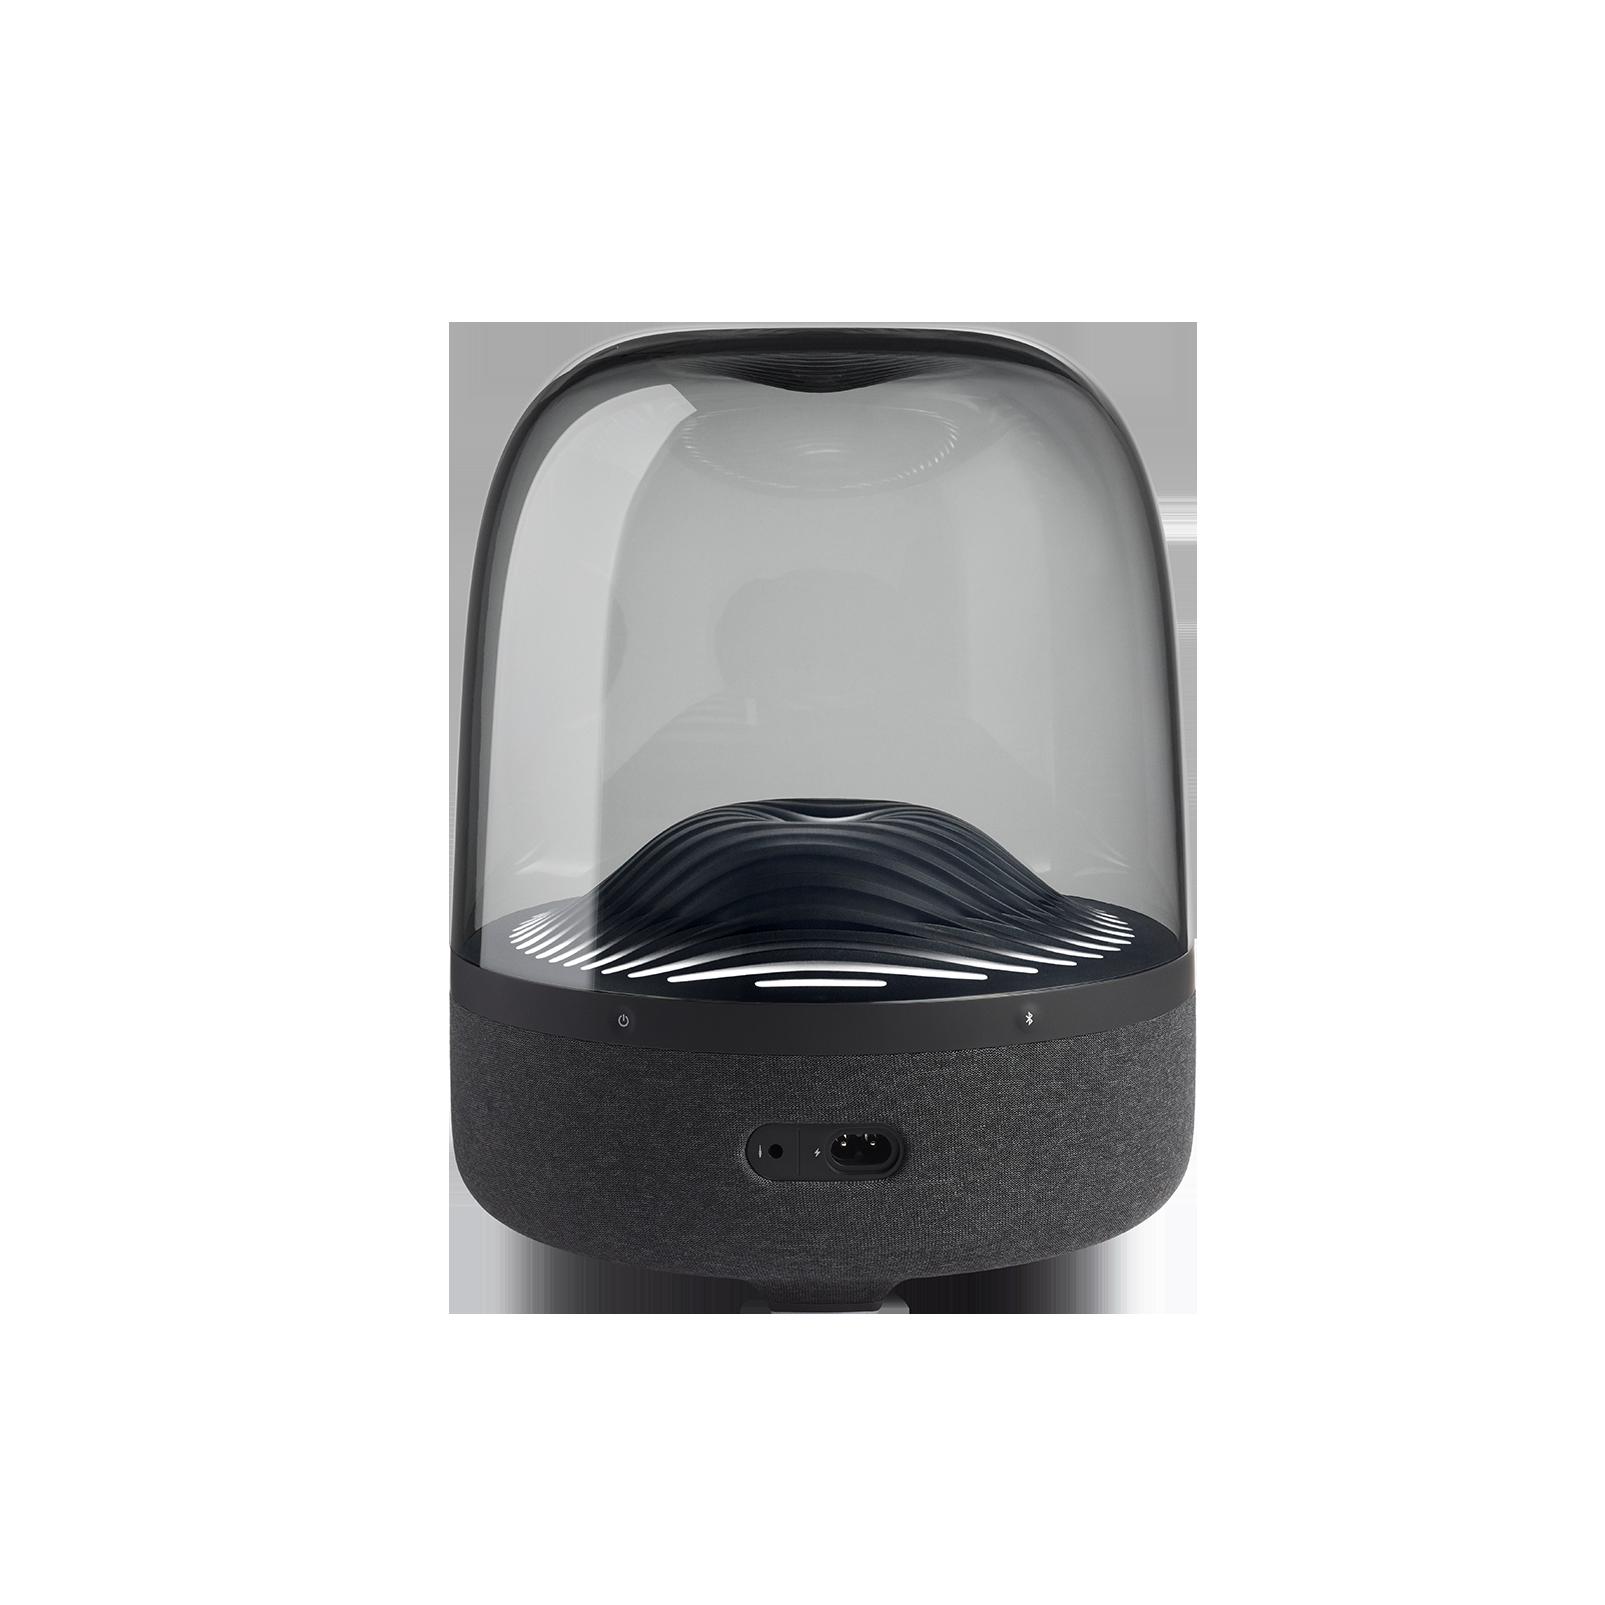 Aura Studio 3 - Black - Bluetooth speaker - Detailshot 1